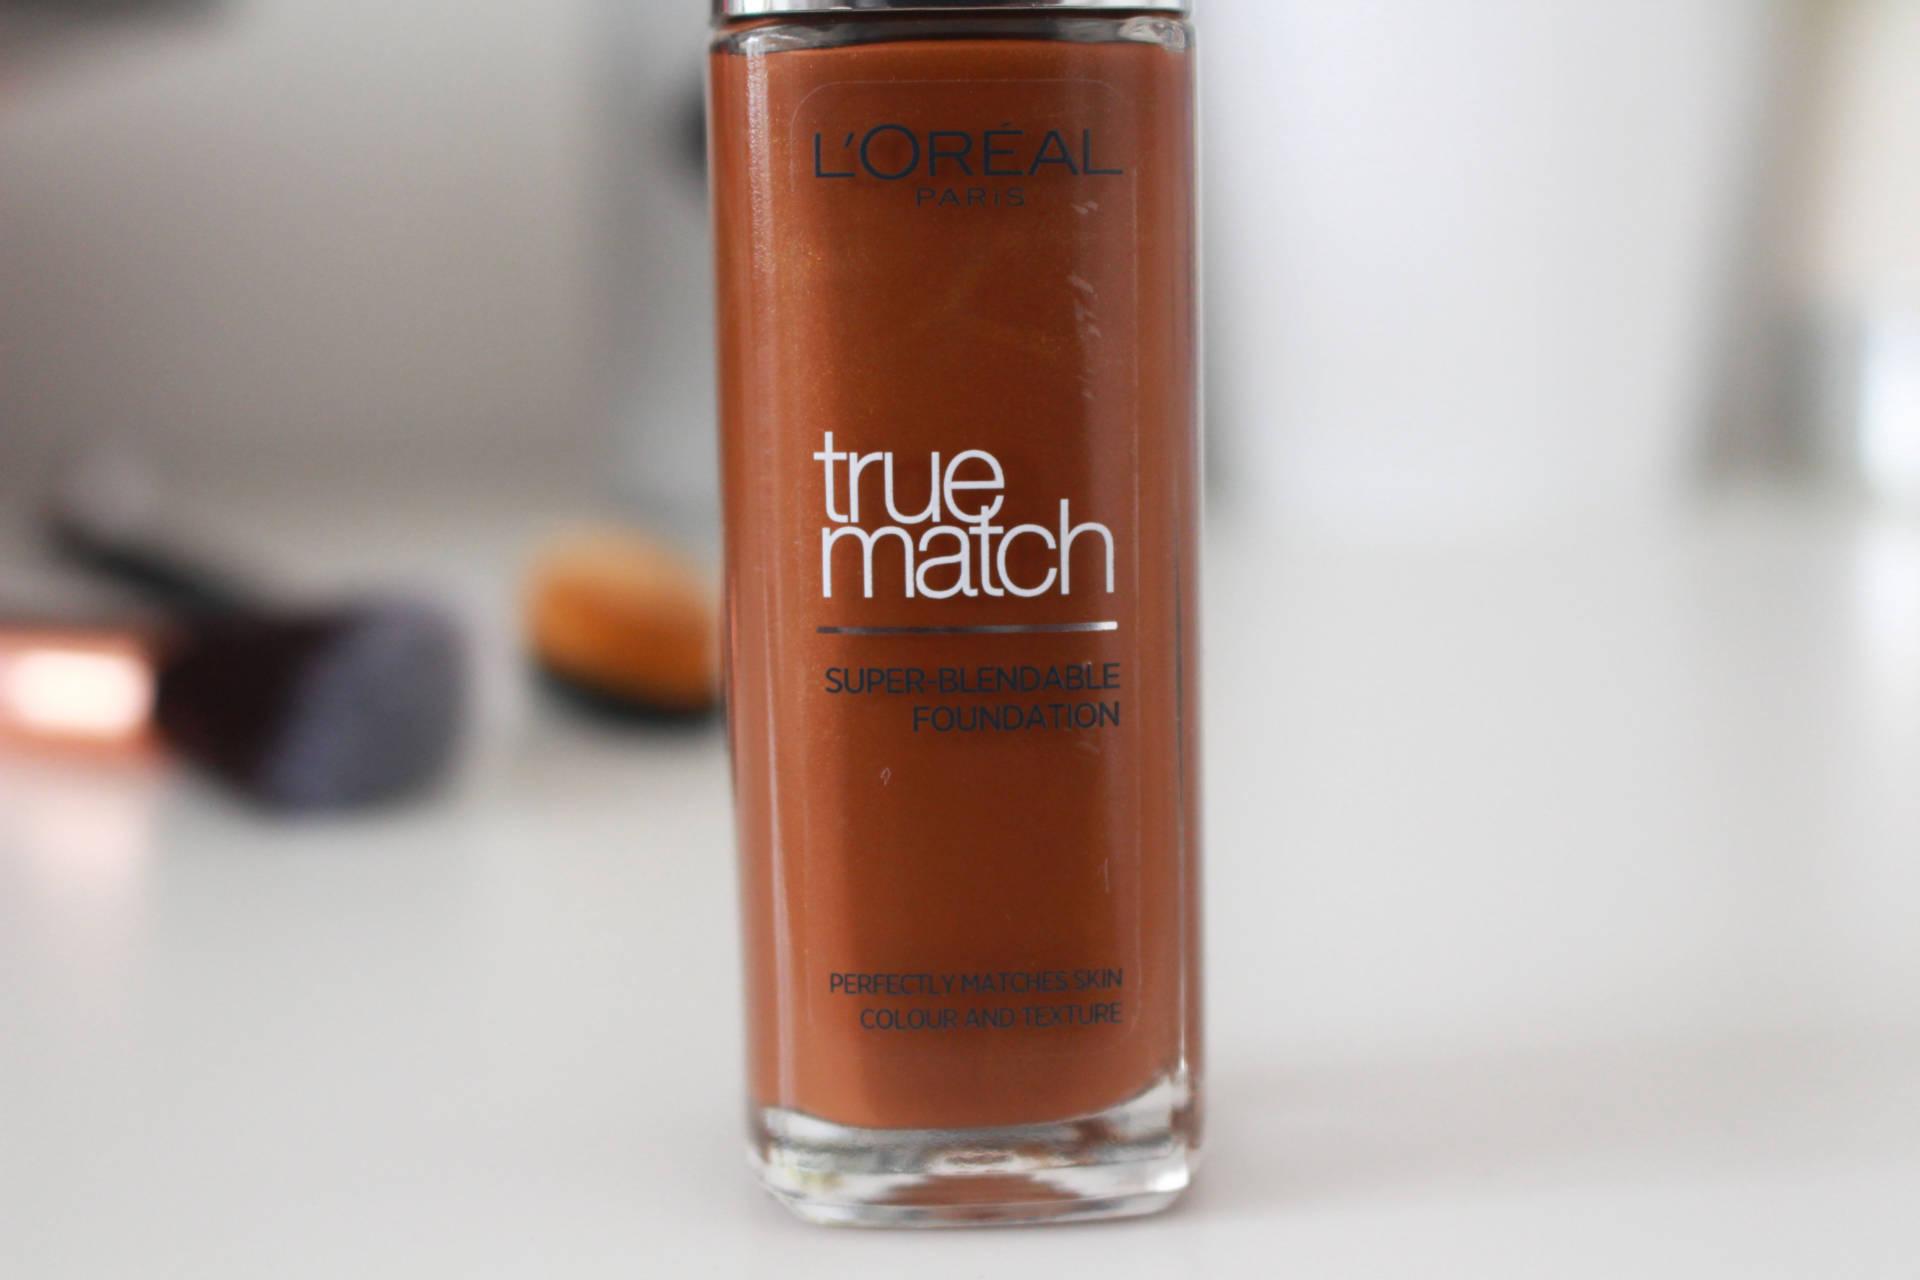 loreal true Match Foundation 2